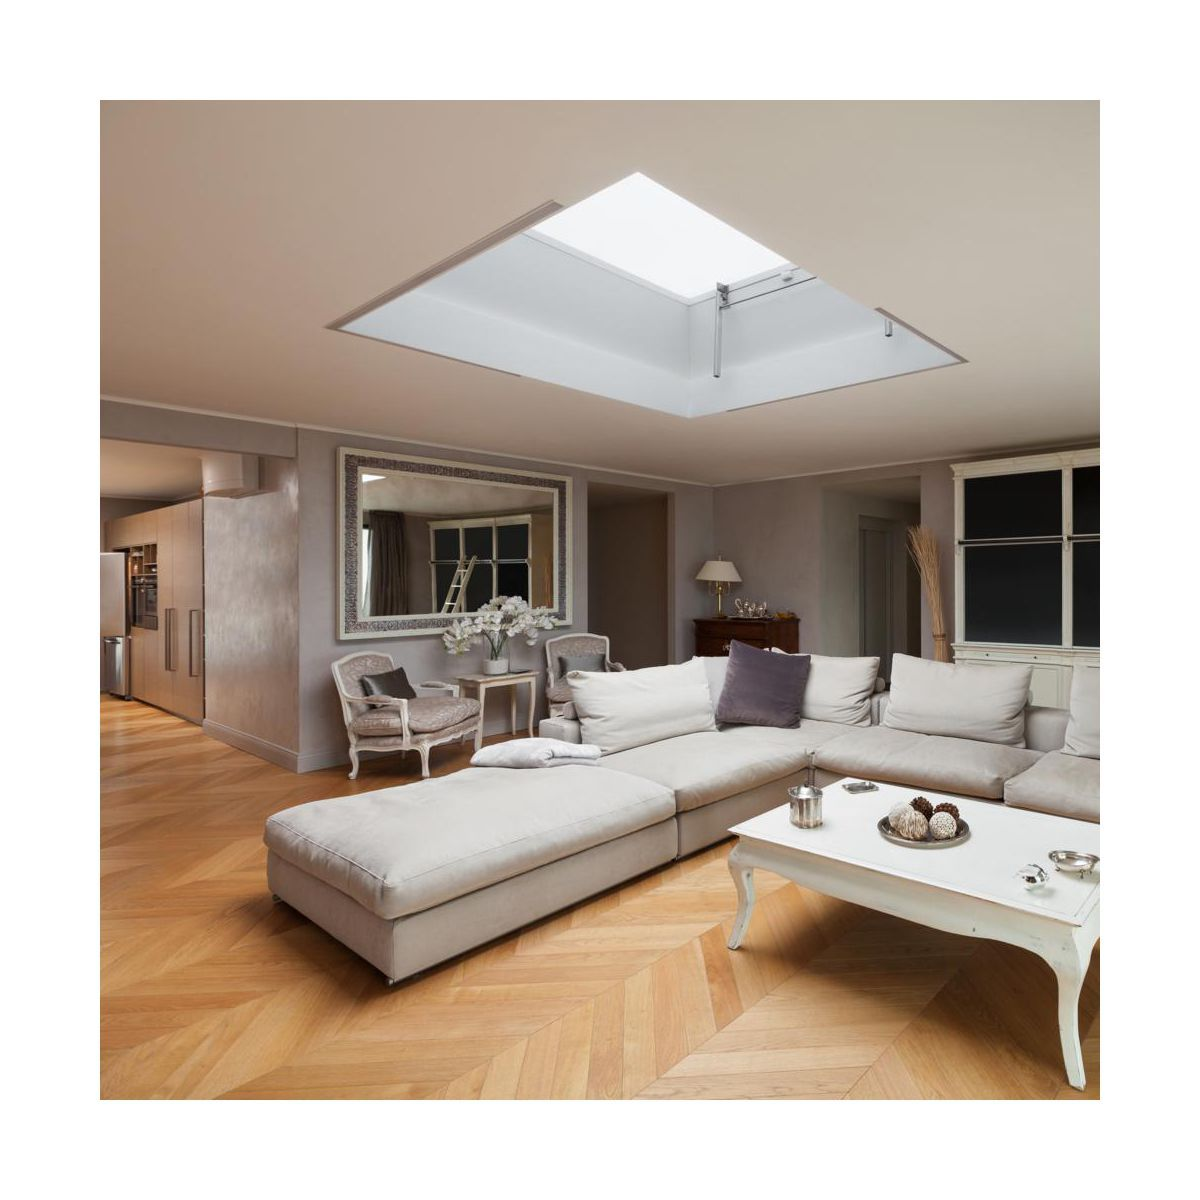 Podloga Dab Jodelka Francuska Dlh Deski Podlogowe W Atrakcyjnej Cenie W Sklepach Leroy Merlin Room Living Room